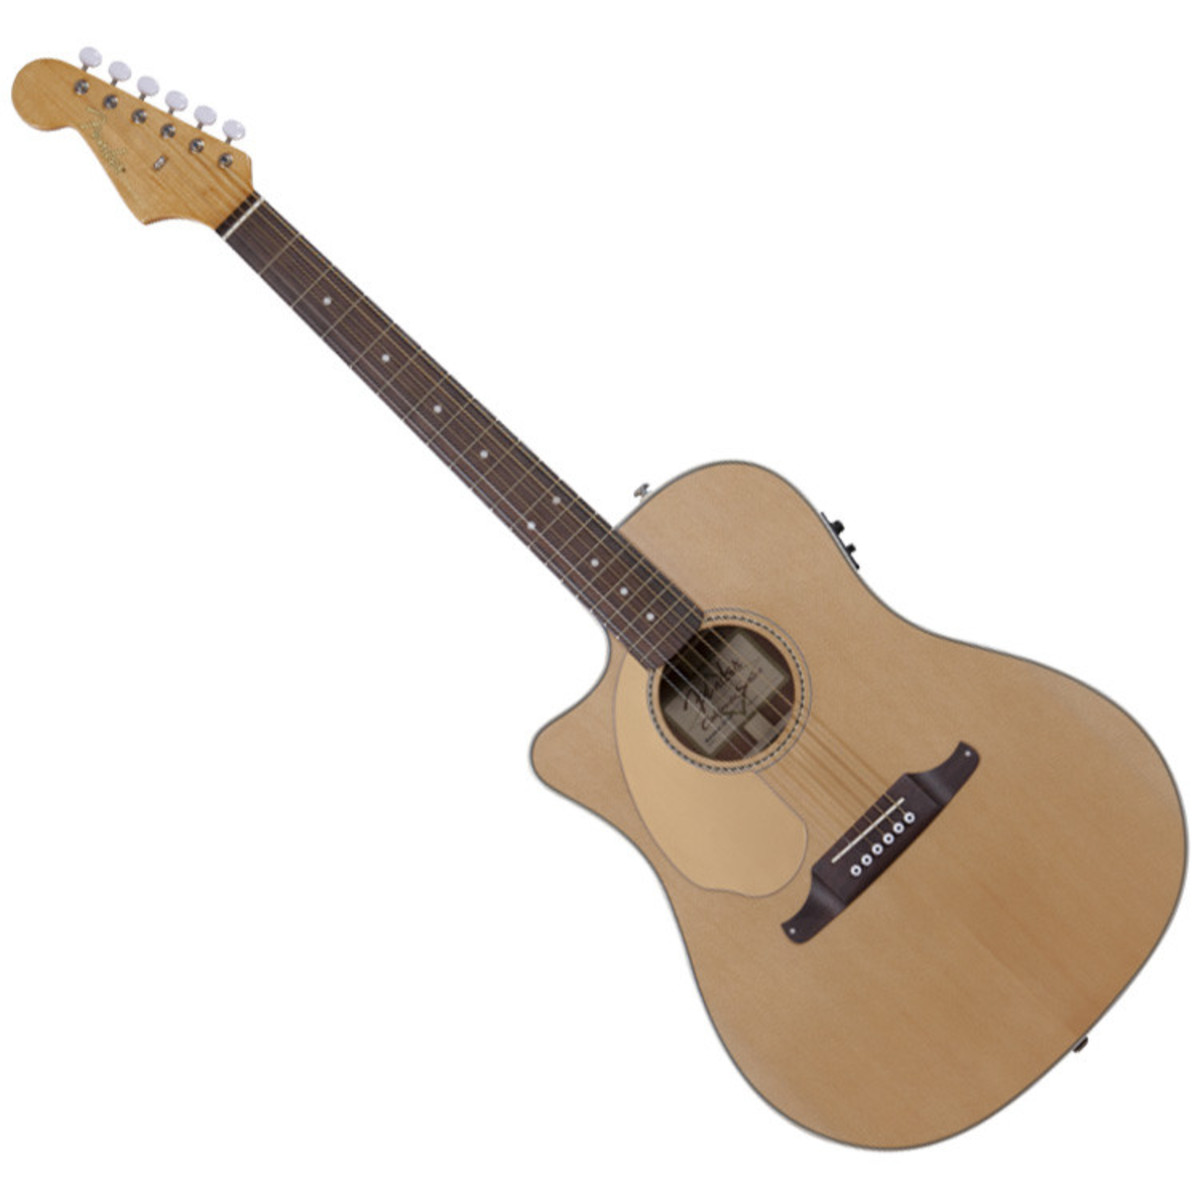 fender sonoran sce left handed electro acoustic guitar natural at gear4music. Black Bedroom Furniture Sets. Home Design Ideas